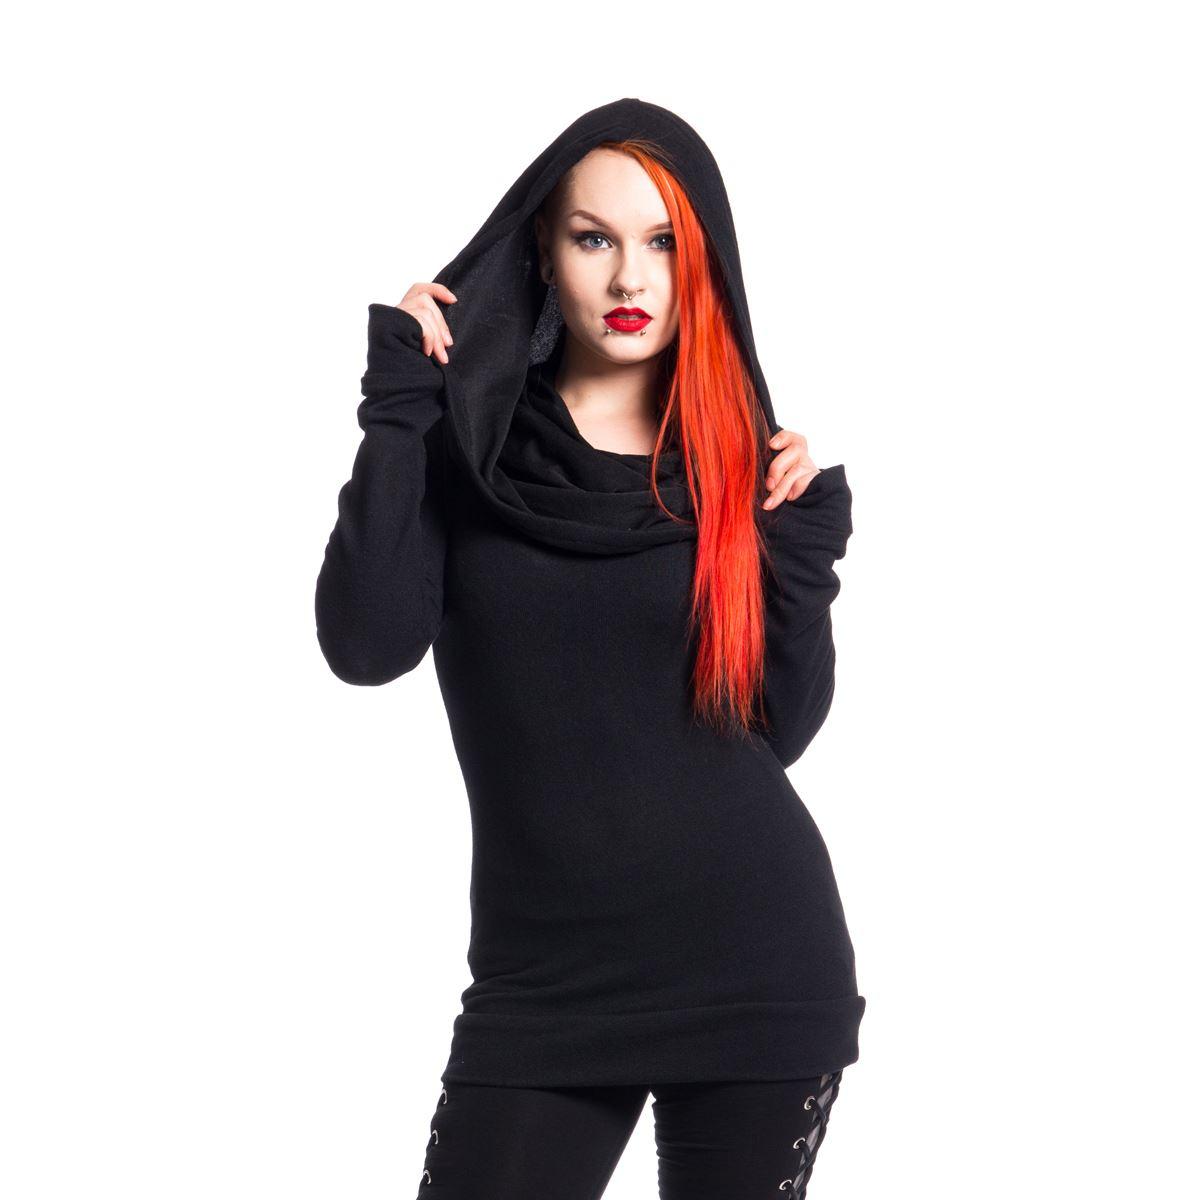 Vixxsin Purity Top Ladies Black Goth Emo Punk